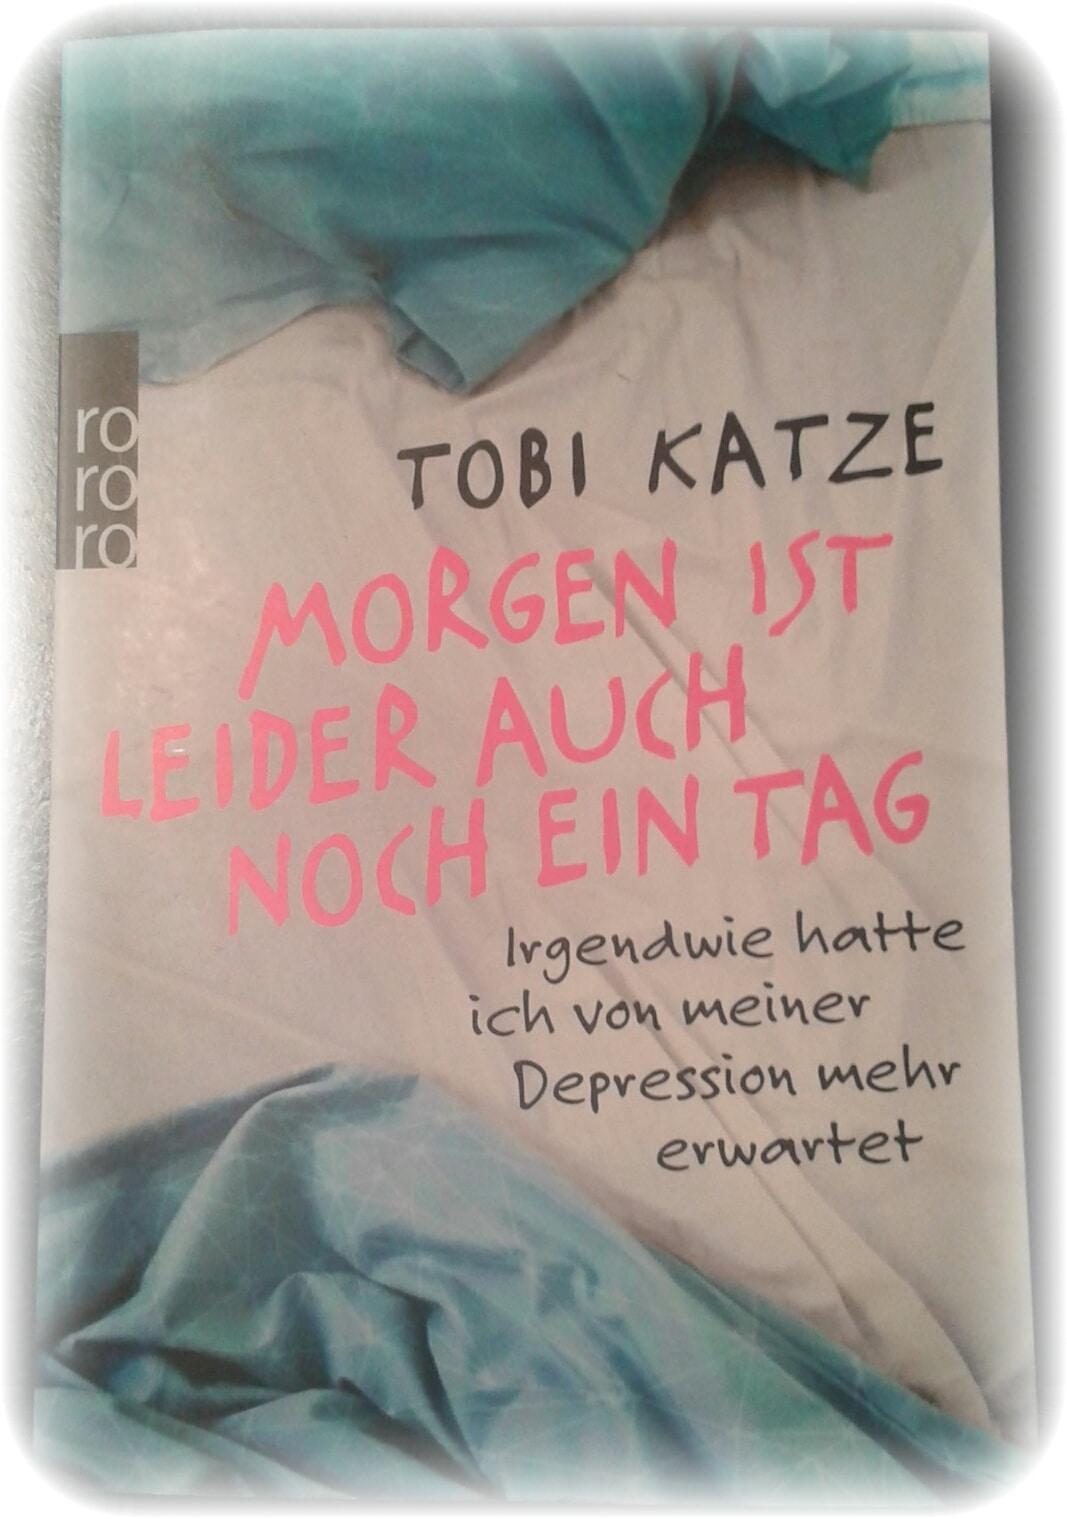 quote-katze-depression